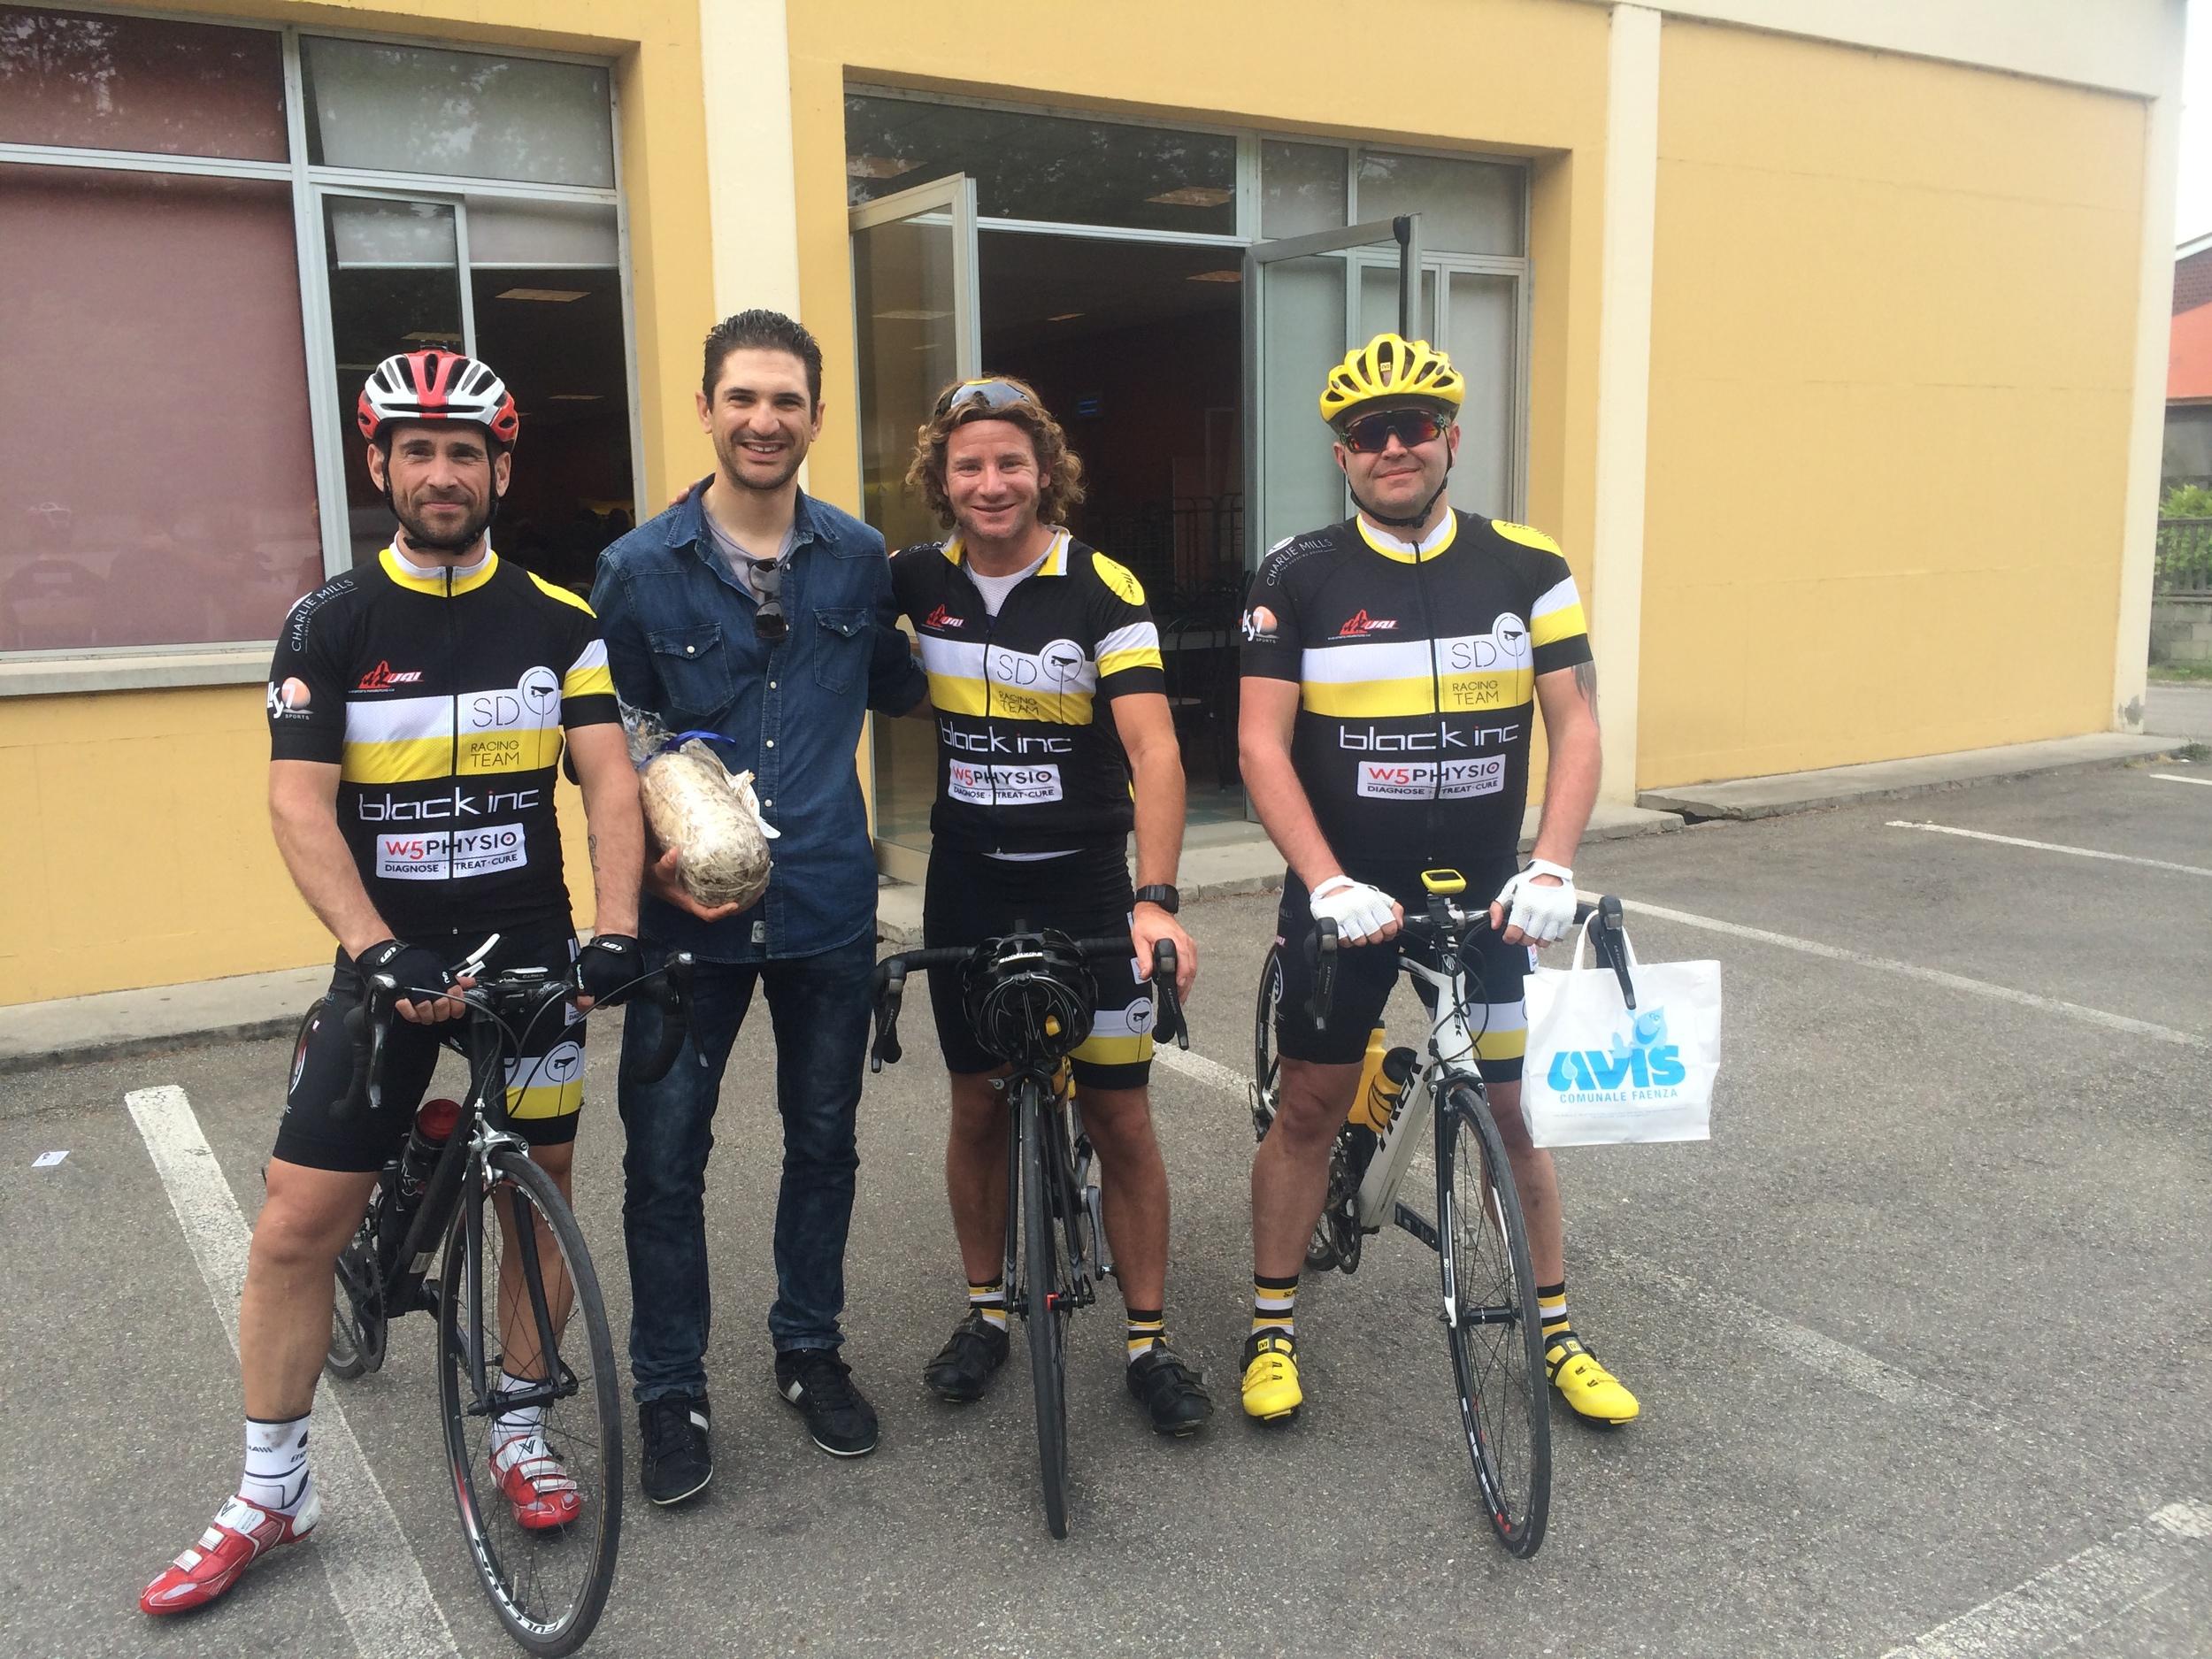 The team with Alan Marangoni of Team Garmin-Cannondale.